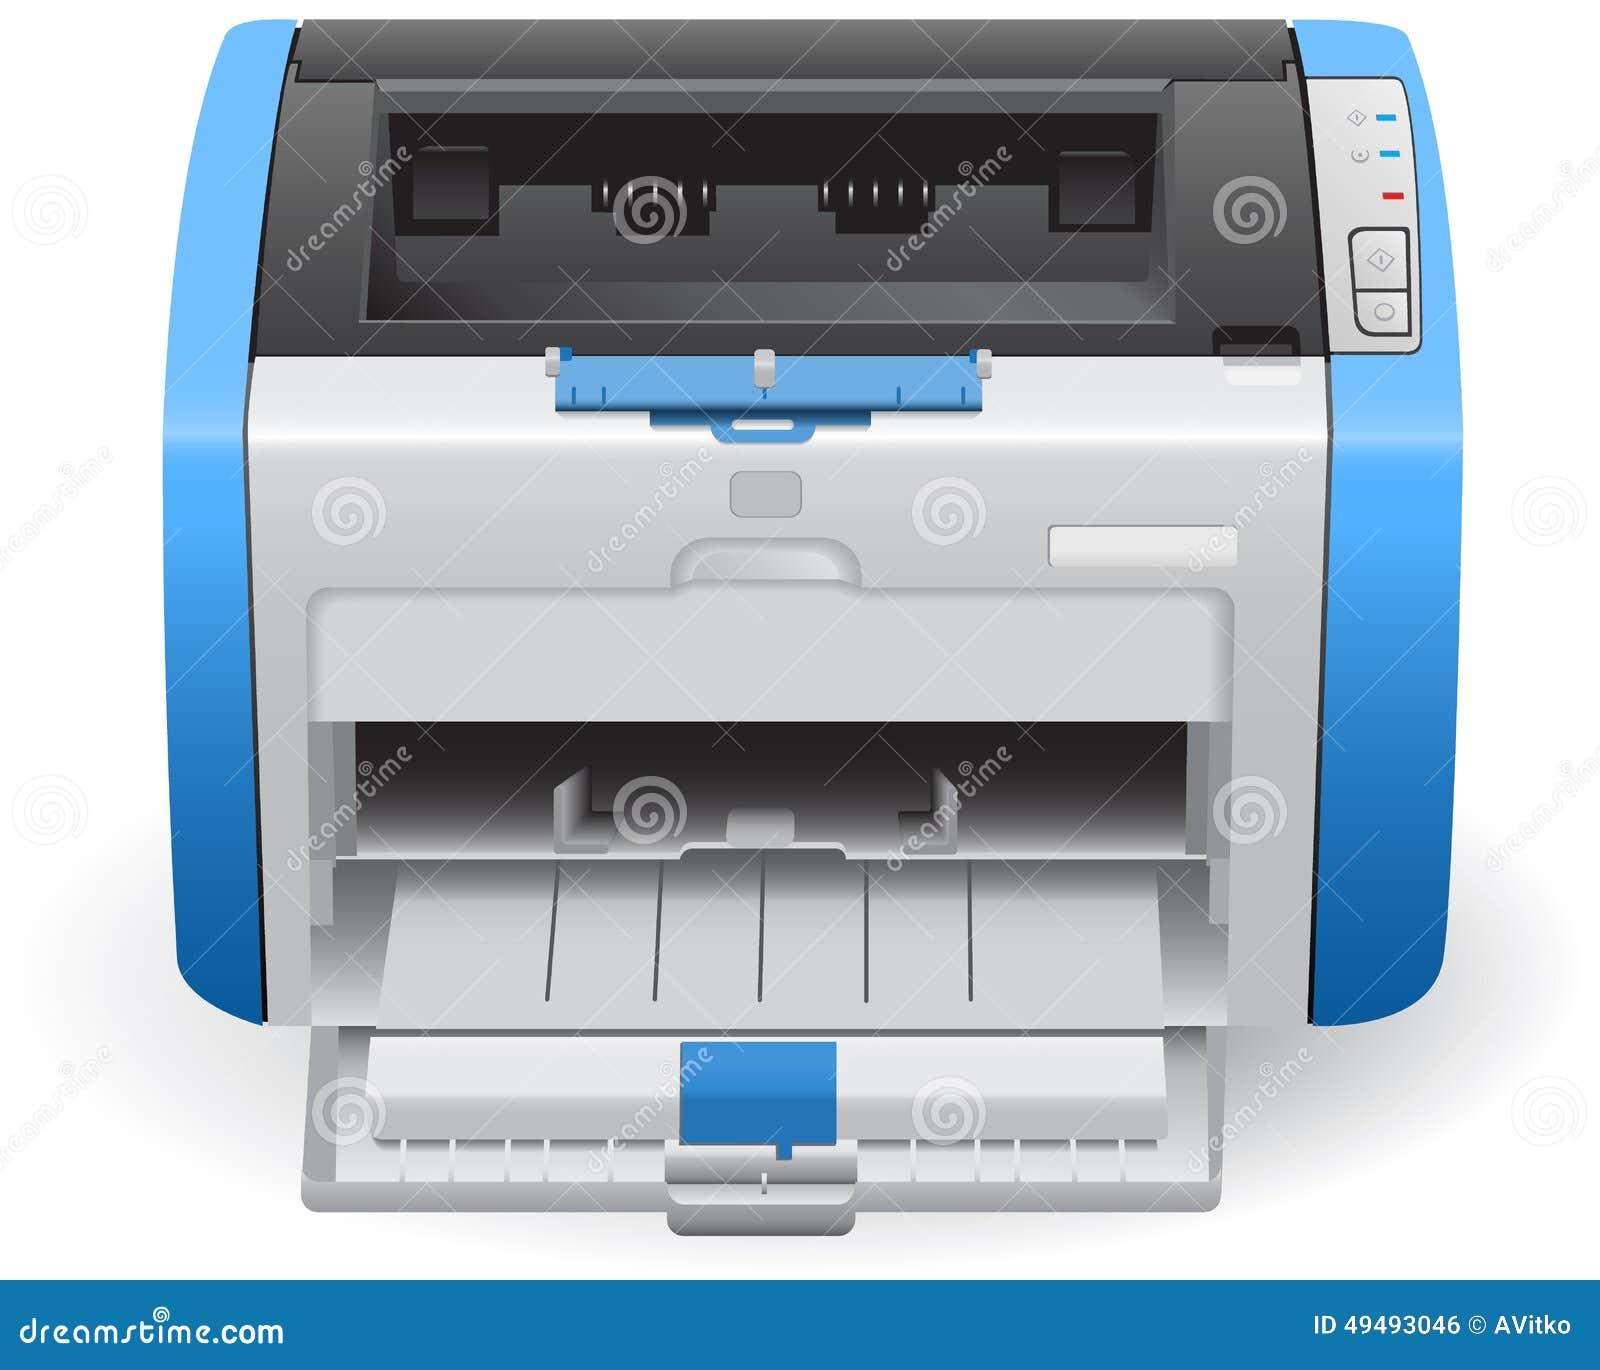 how to clean hp laserjet 1022 printer